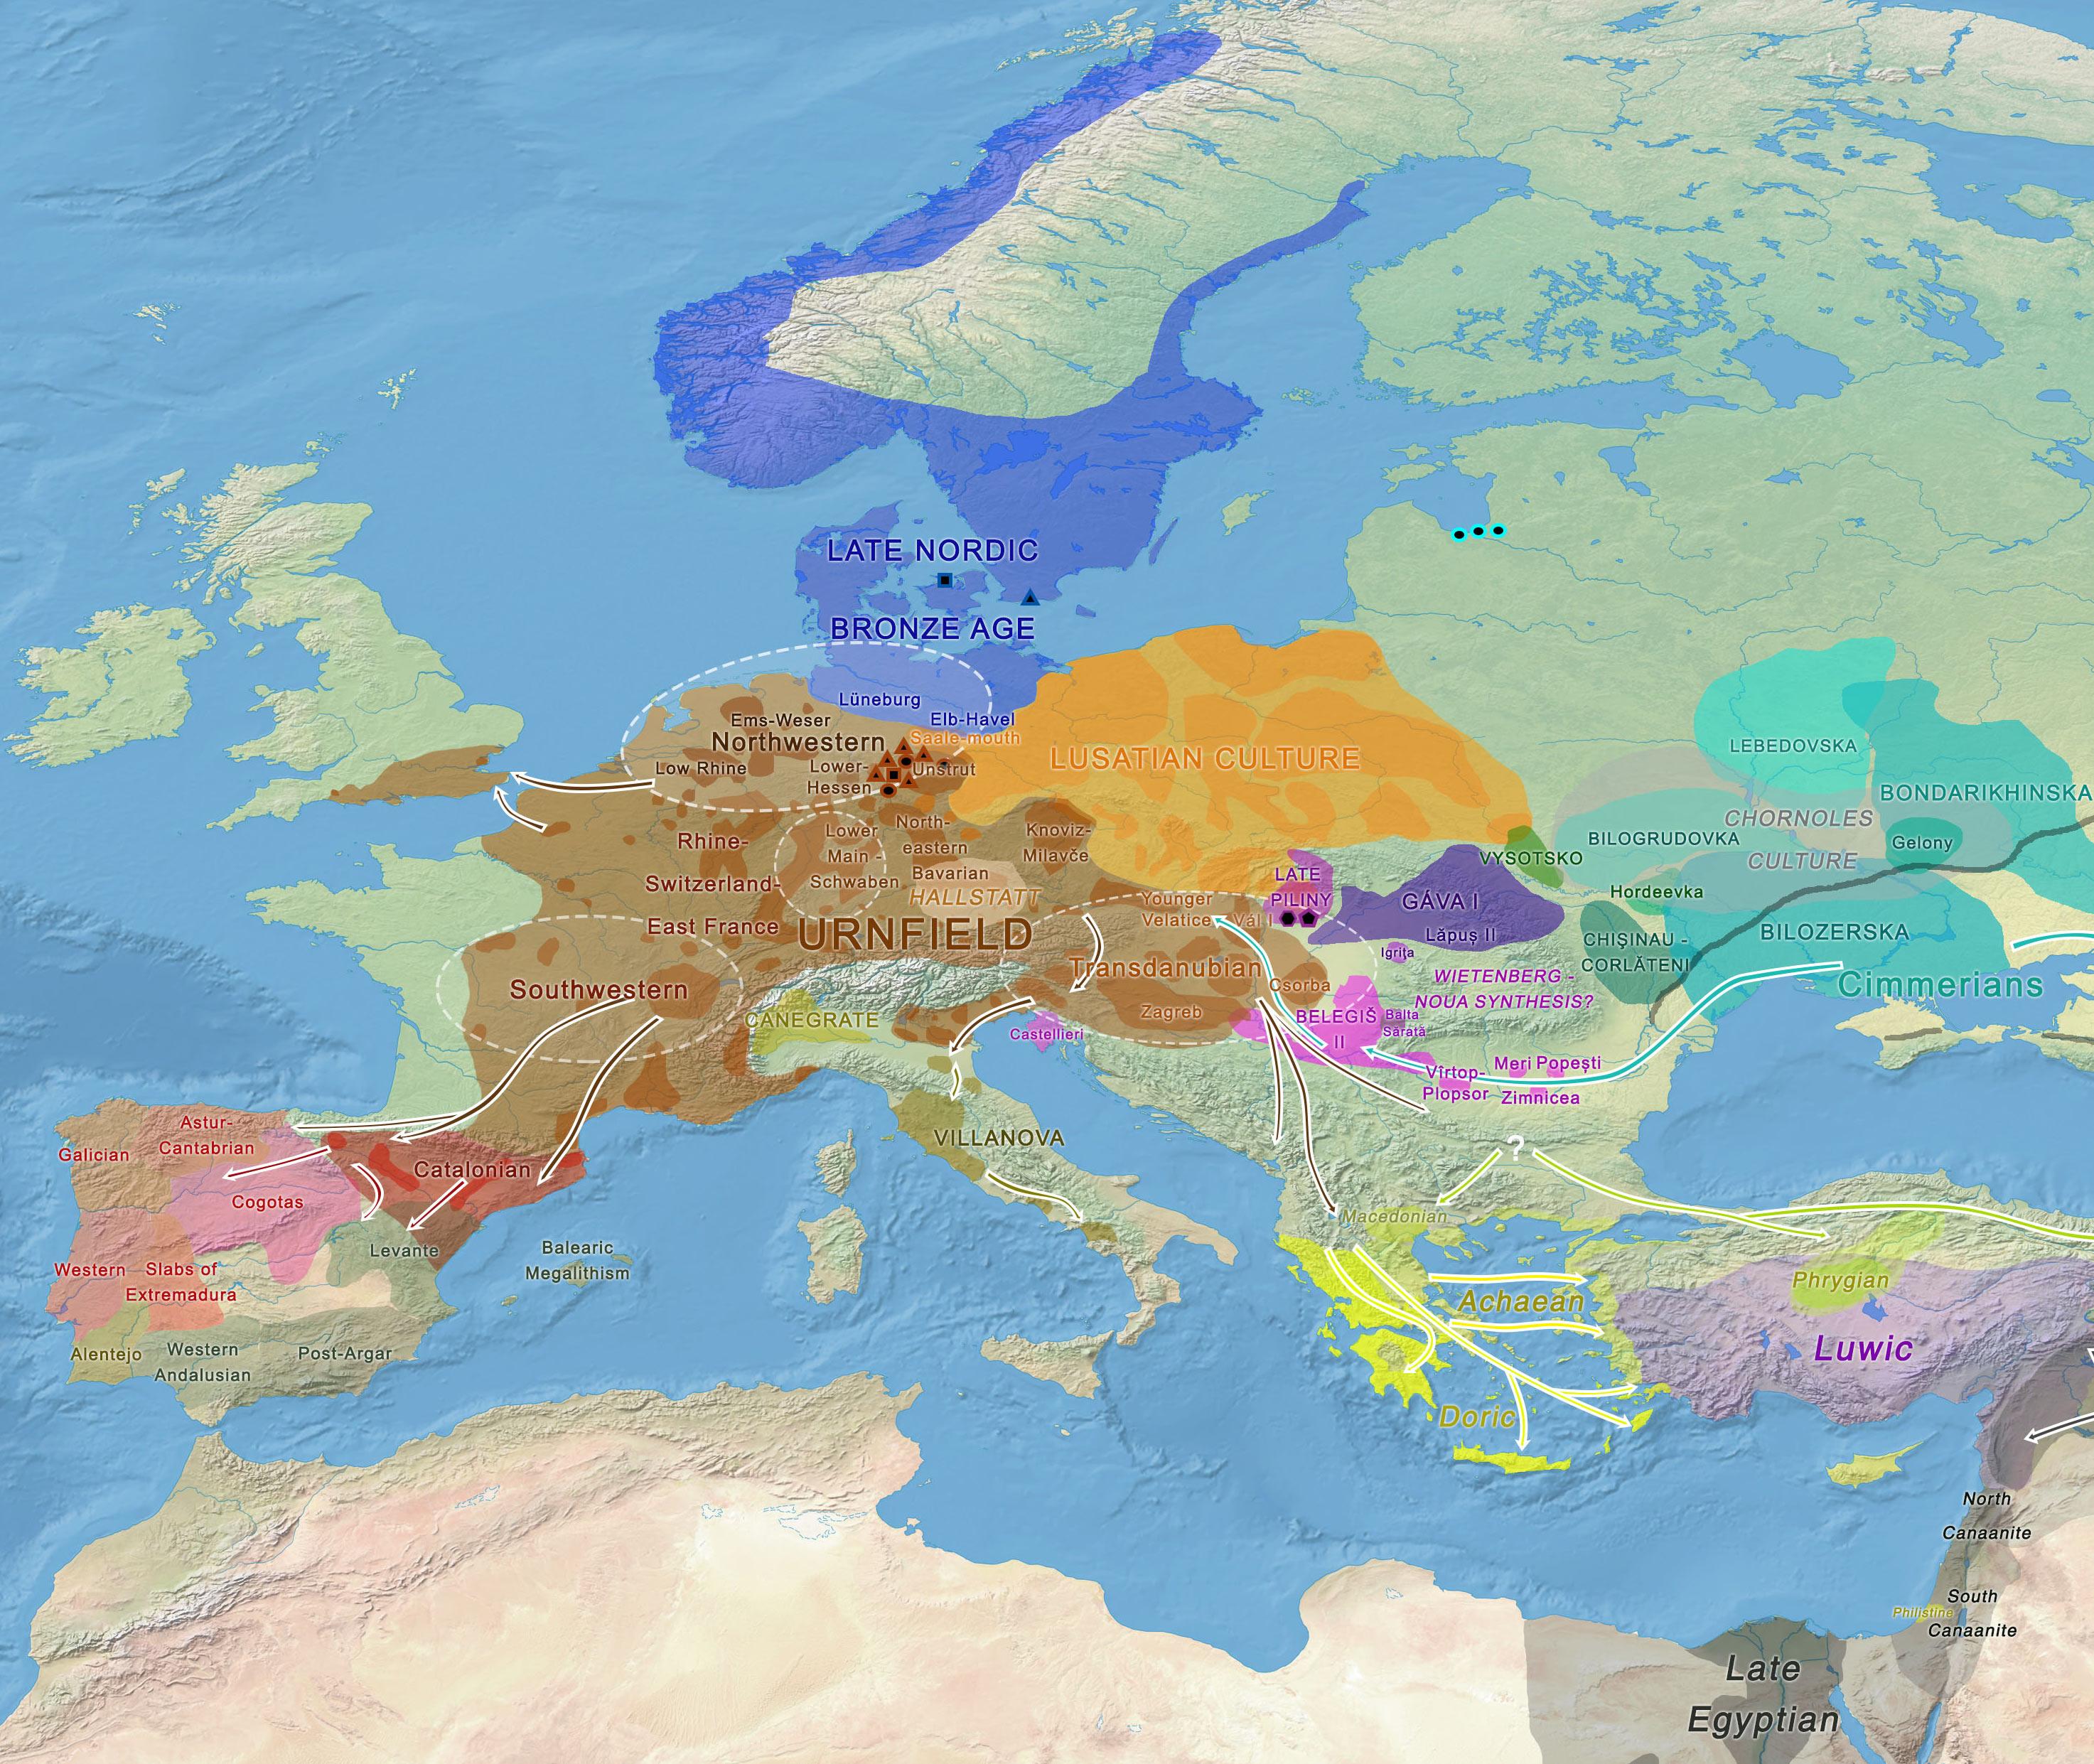 bronze-age-late-europe.jpg